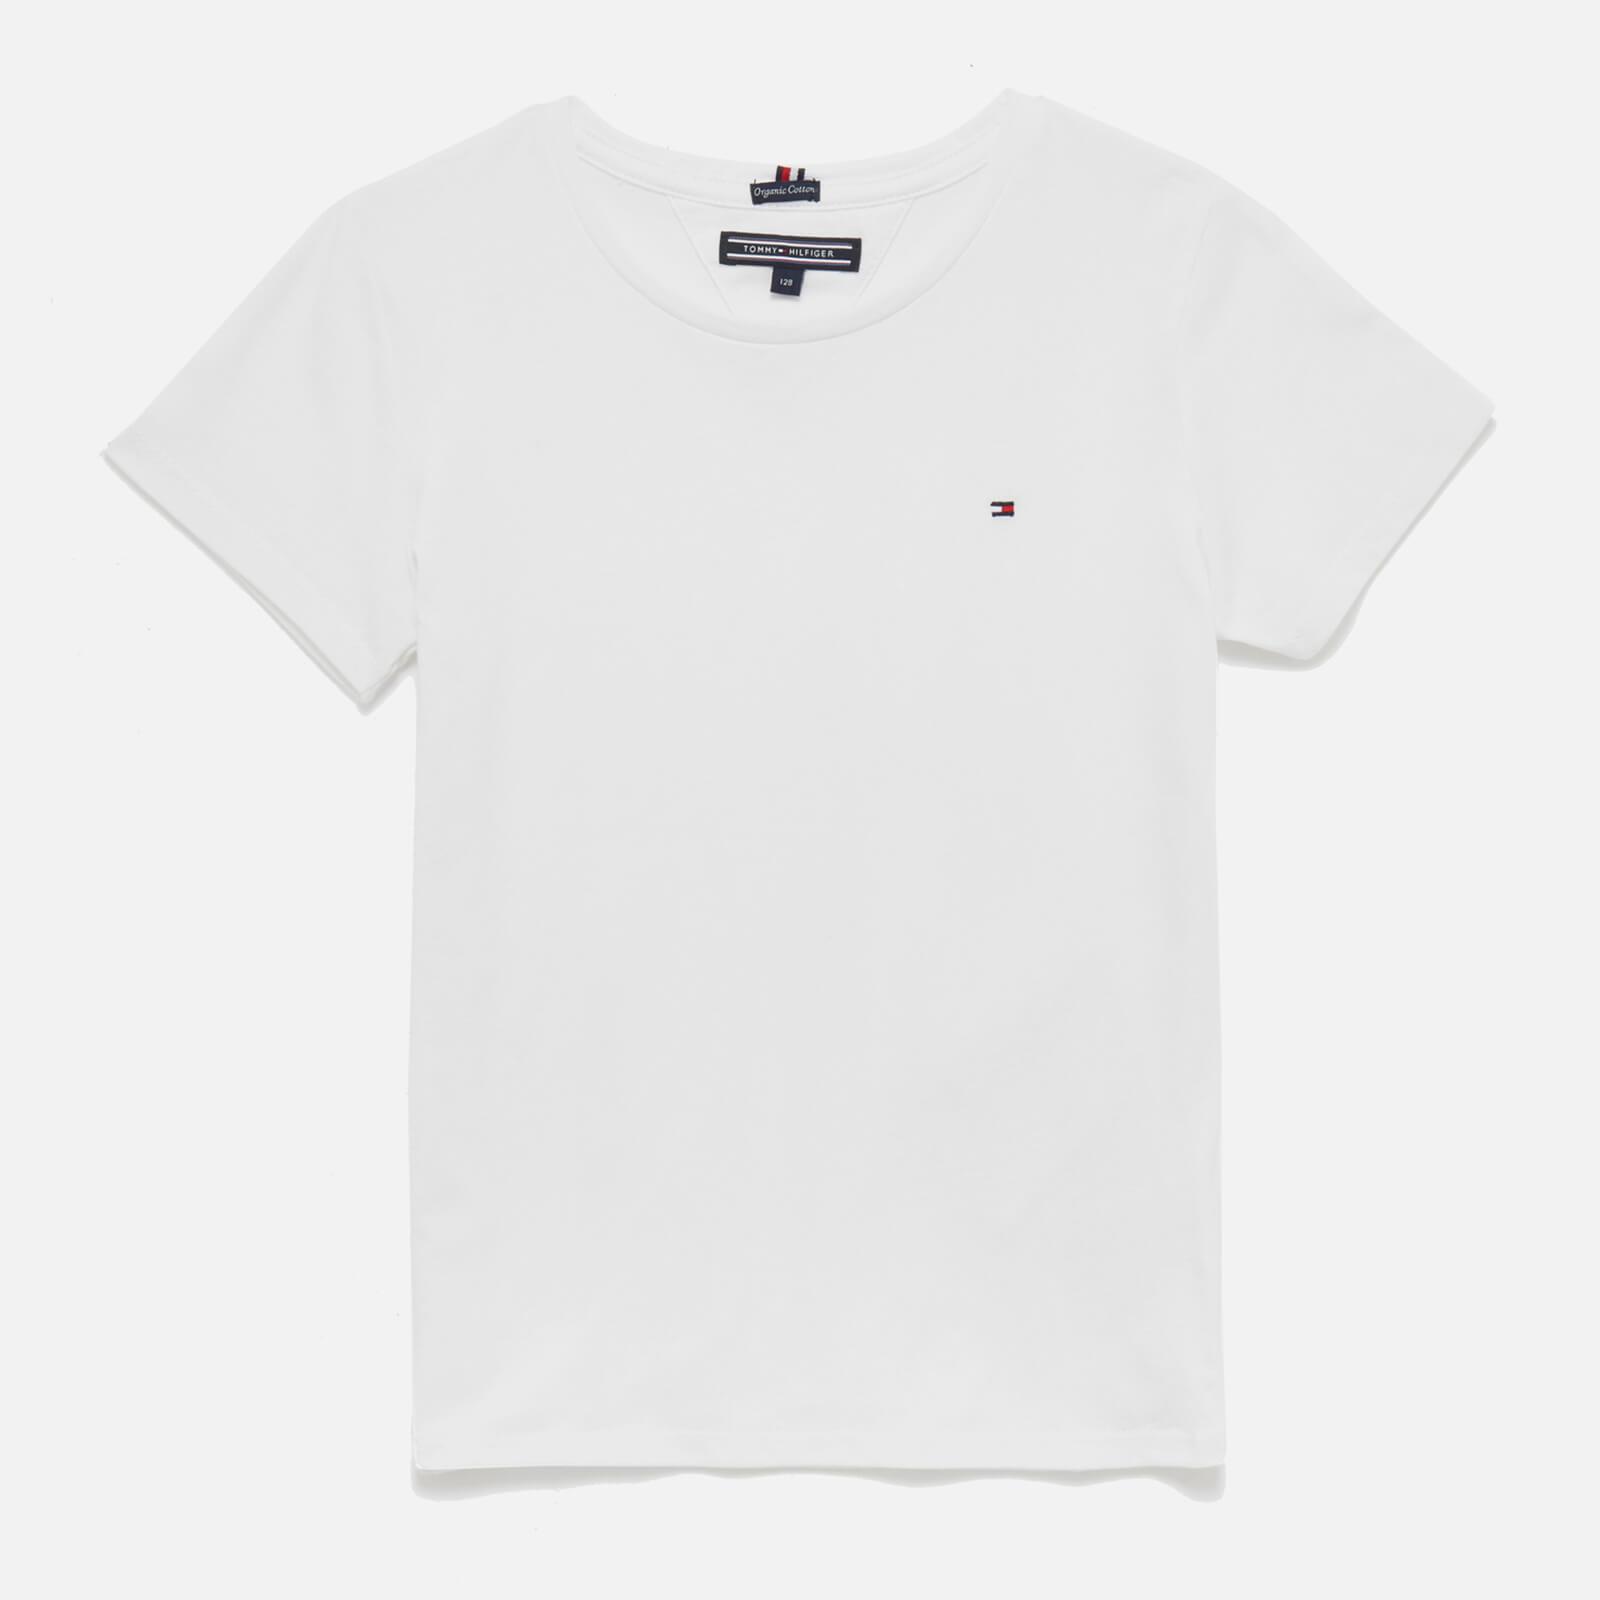 Tommy Kids Girls' Short Sleeve T-Shirt - Bright White - 8 Years